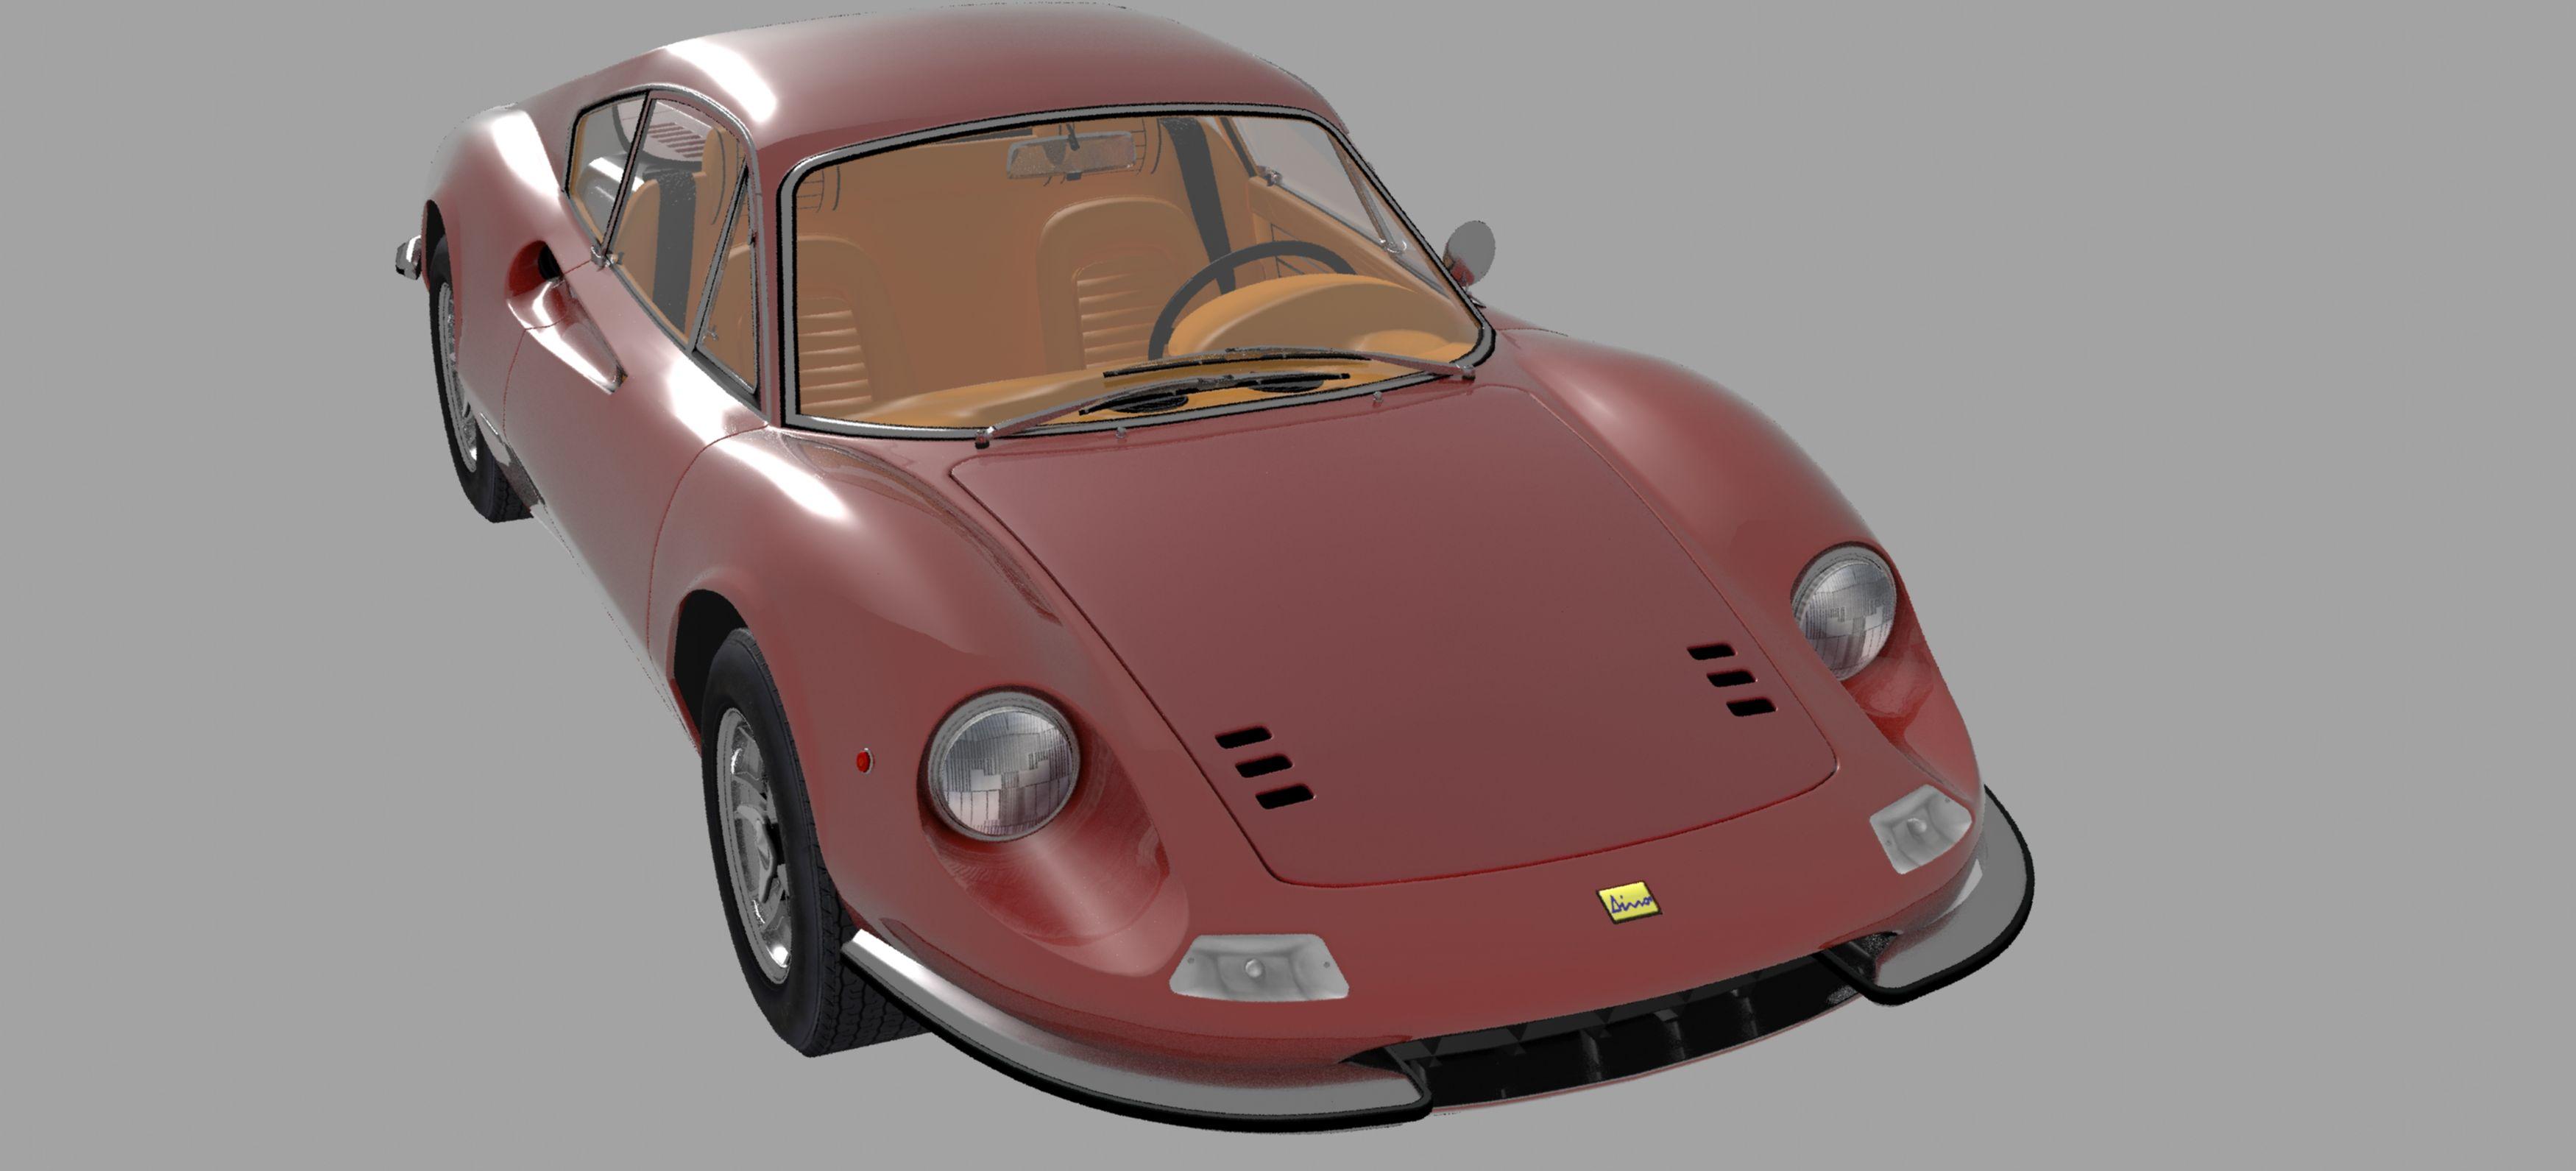 Ferrari-dino-246gt-5-3500-3500